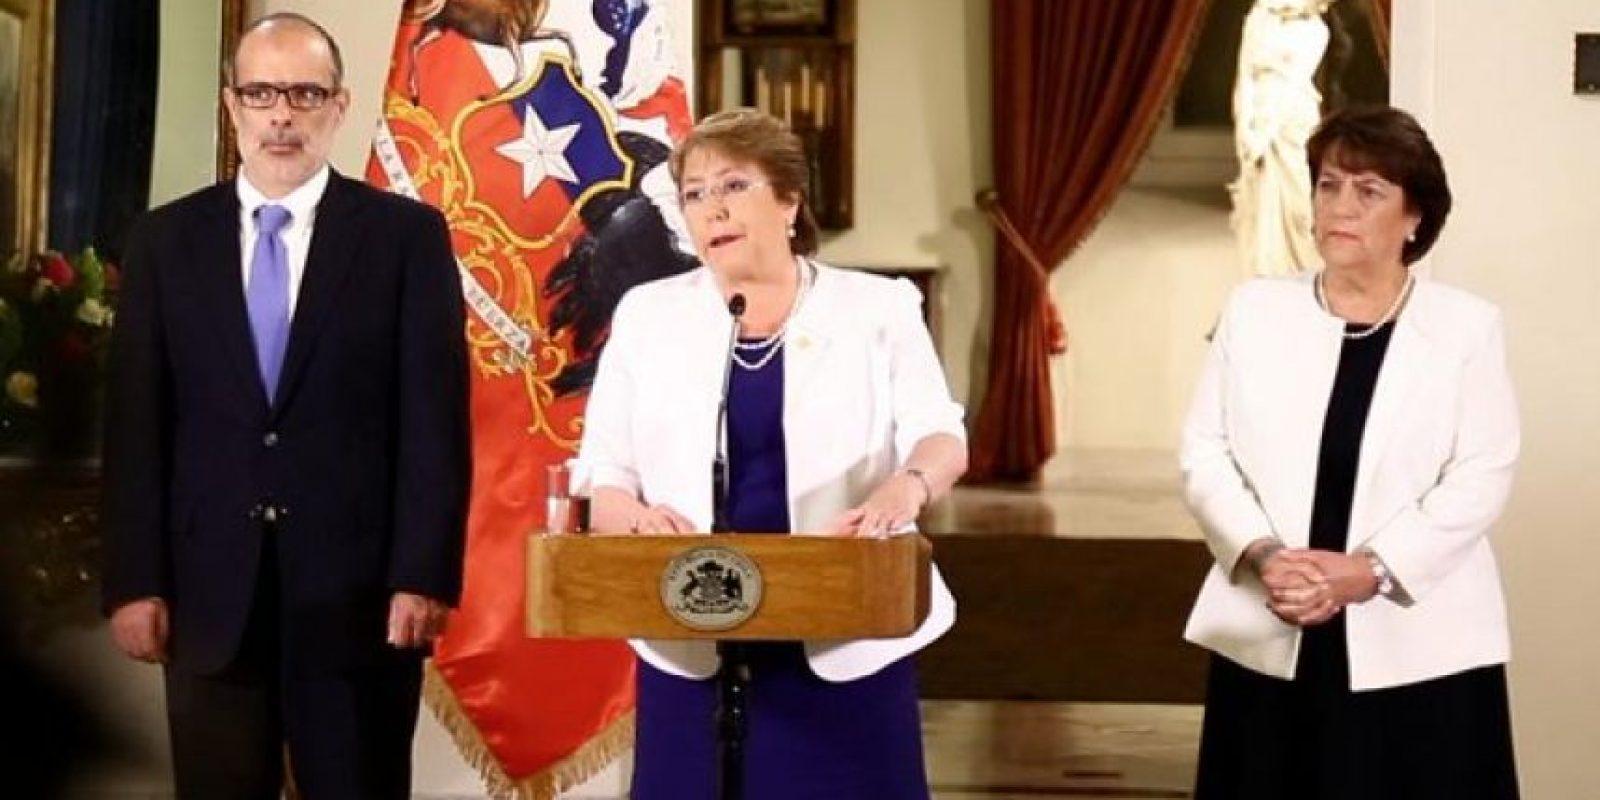 Michelle Bachelet, 2015. Su segundo mandato presidencial inició en 2014. Foto:Twitter.com/GobiernodeChile